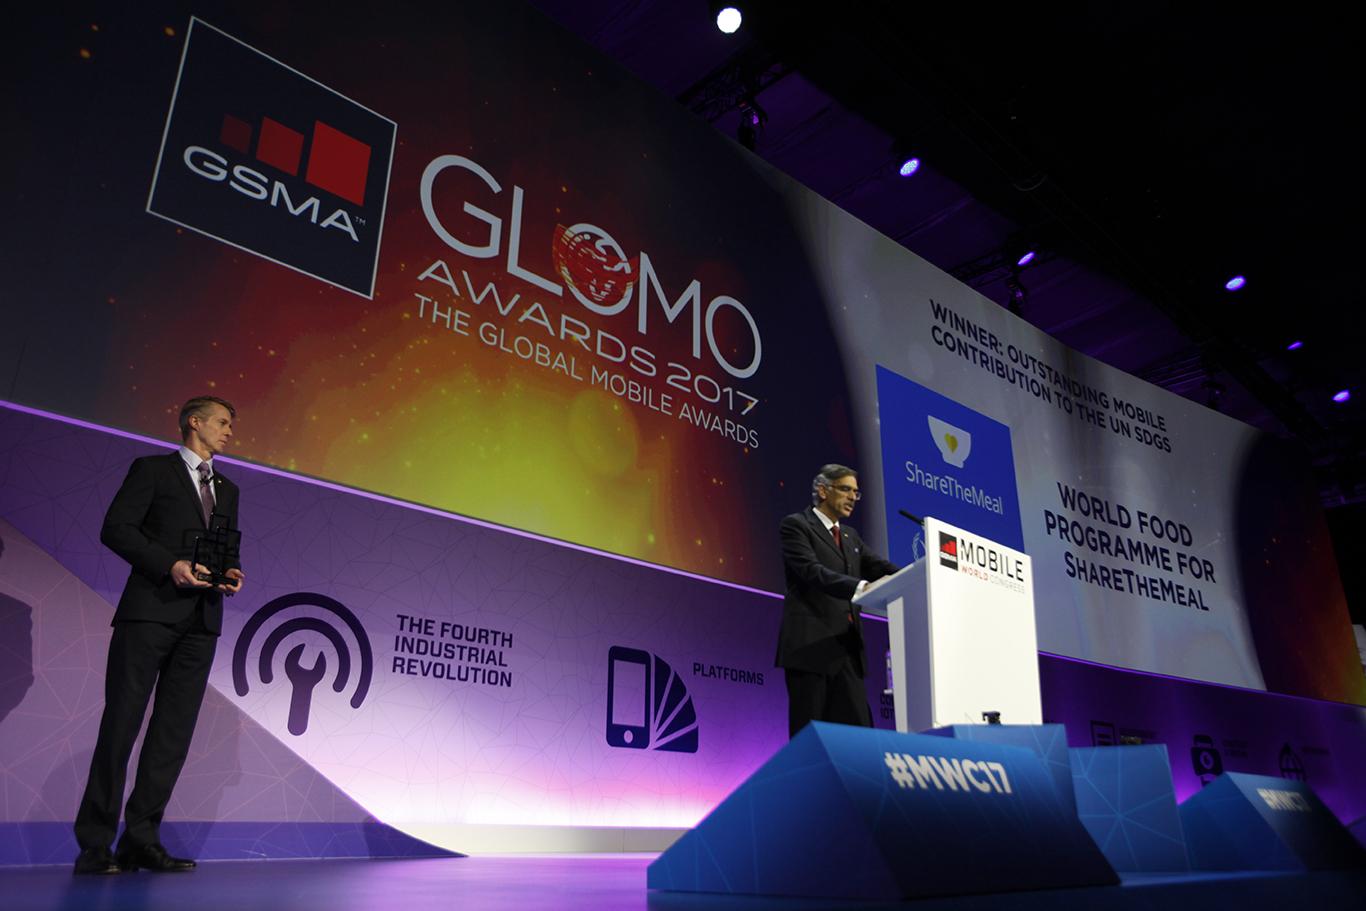 Mobile World Congress 2017   EcoNet, Shell, Cisco, others win 2017 Glomo Awards